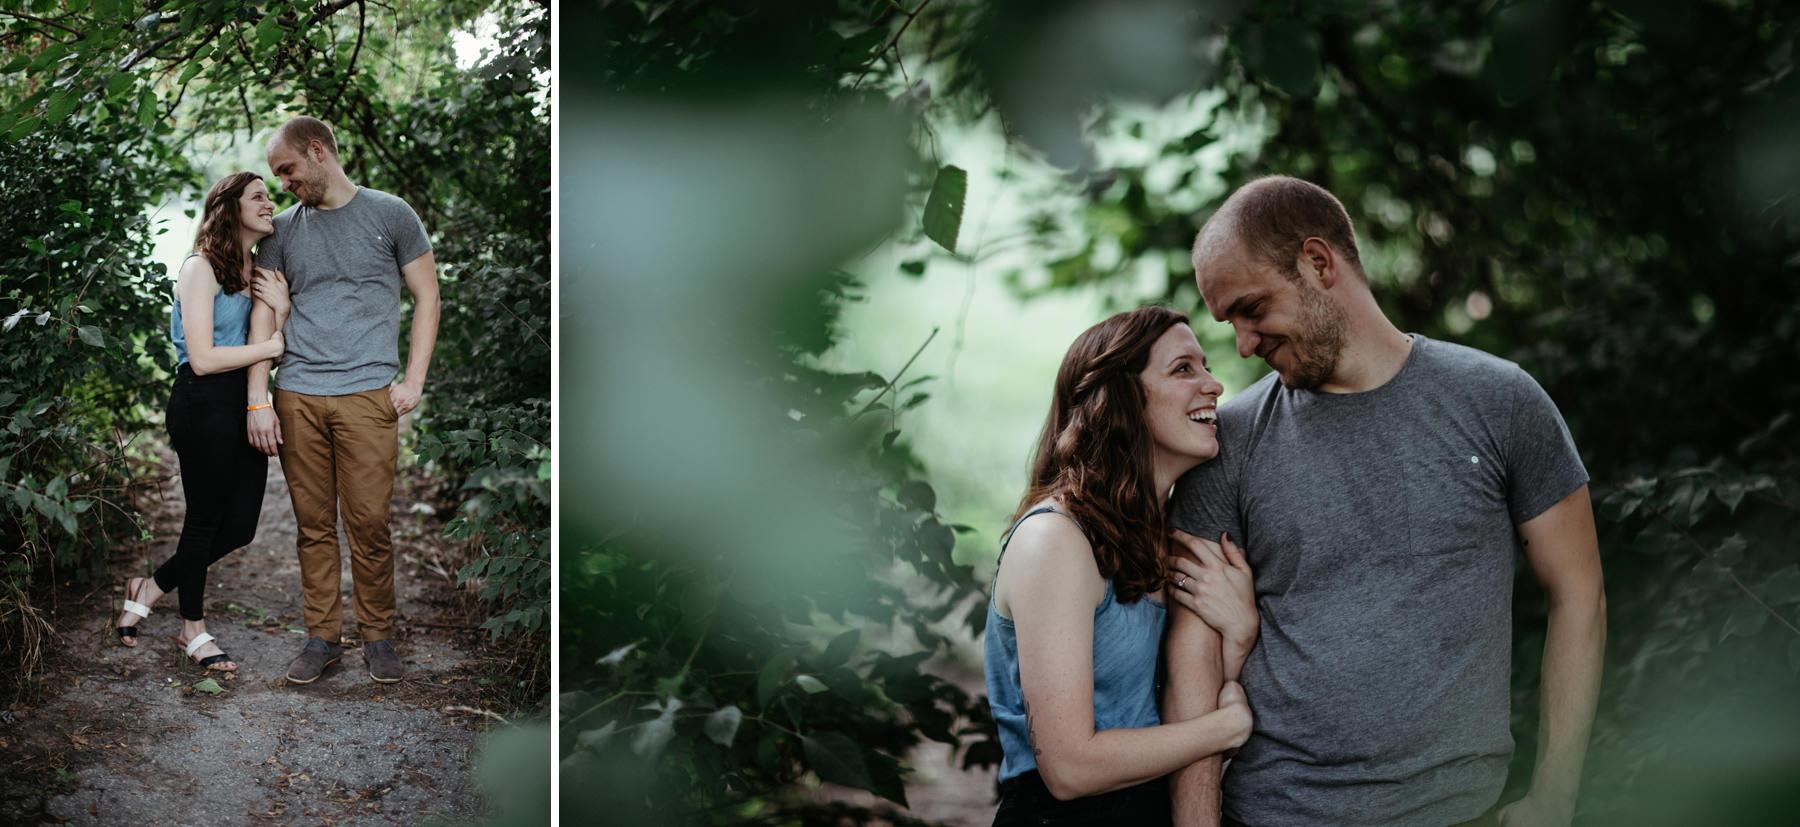 Kansas City_Penn Valley Park_Engagement Session_Kindling Wedding Photography28.JPG